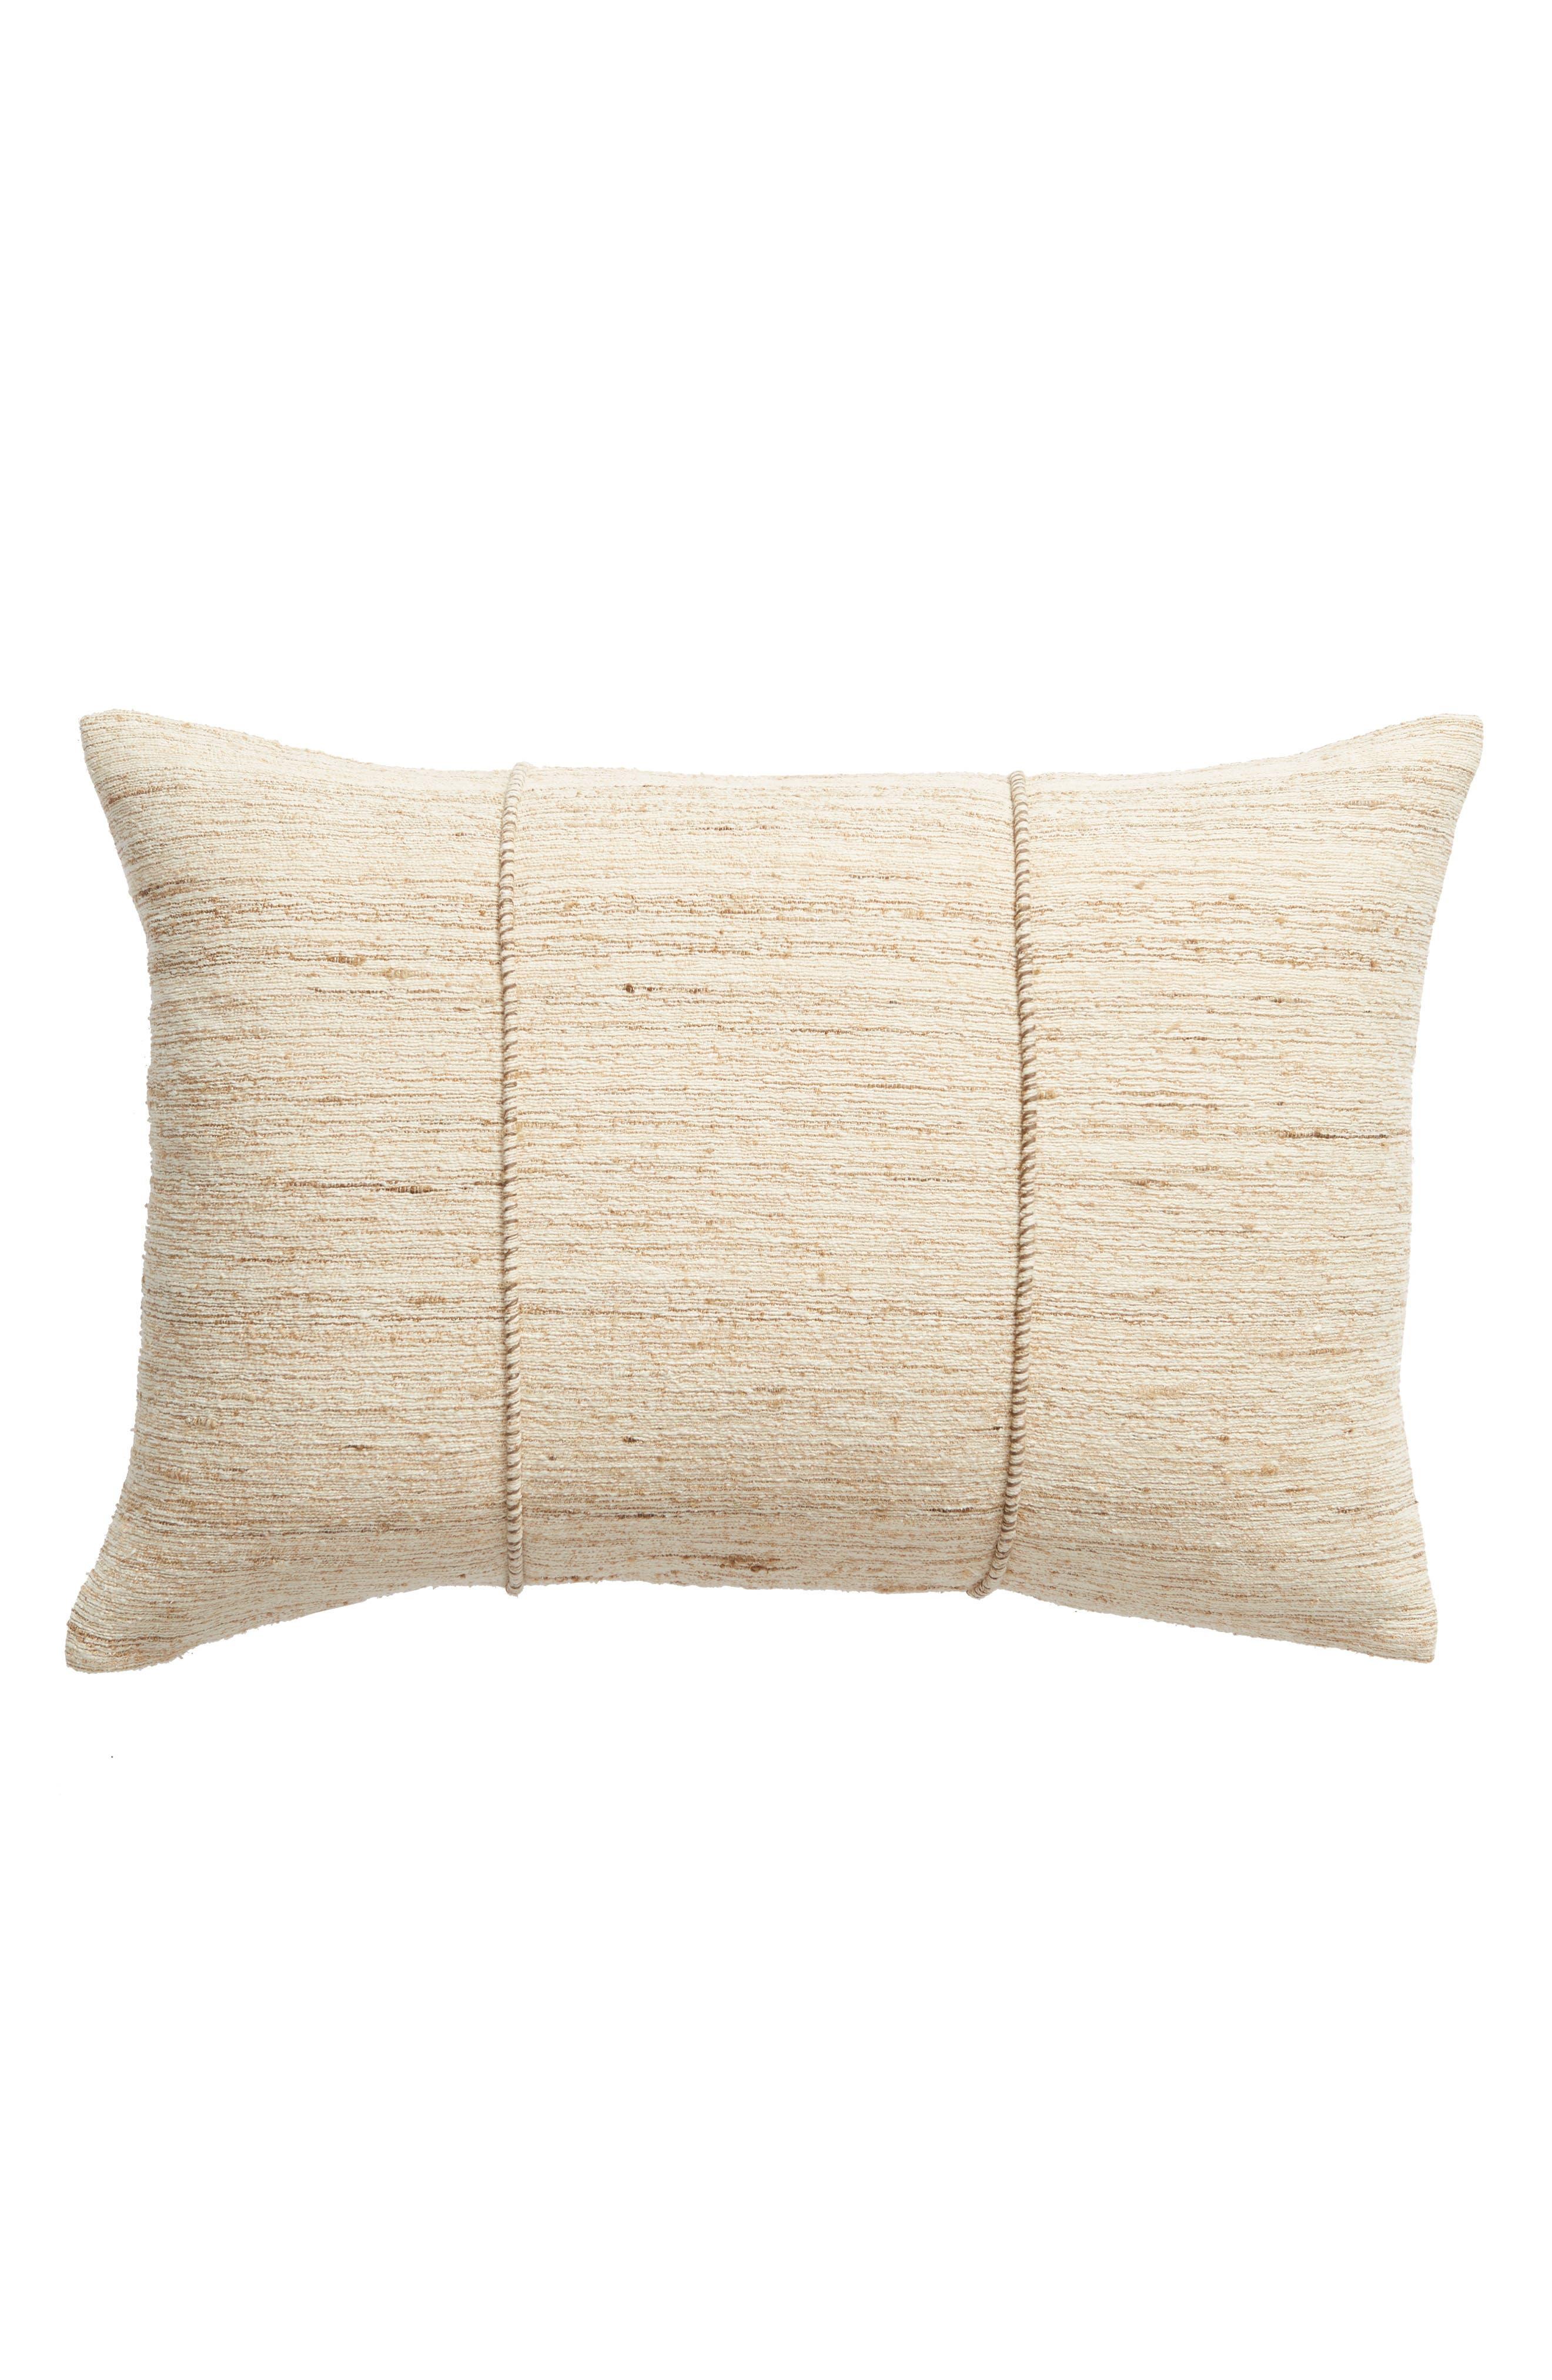 TREASURE & BOND, Pieced Cotton & Silk Accent Pillow, Main thumbnail 1, color, NATURAL MULTI